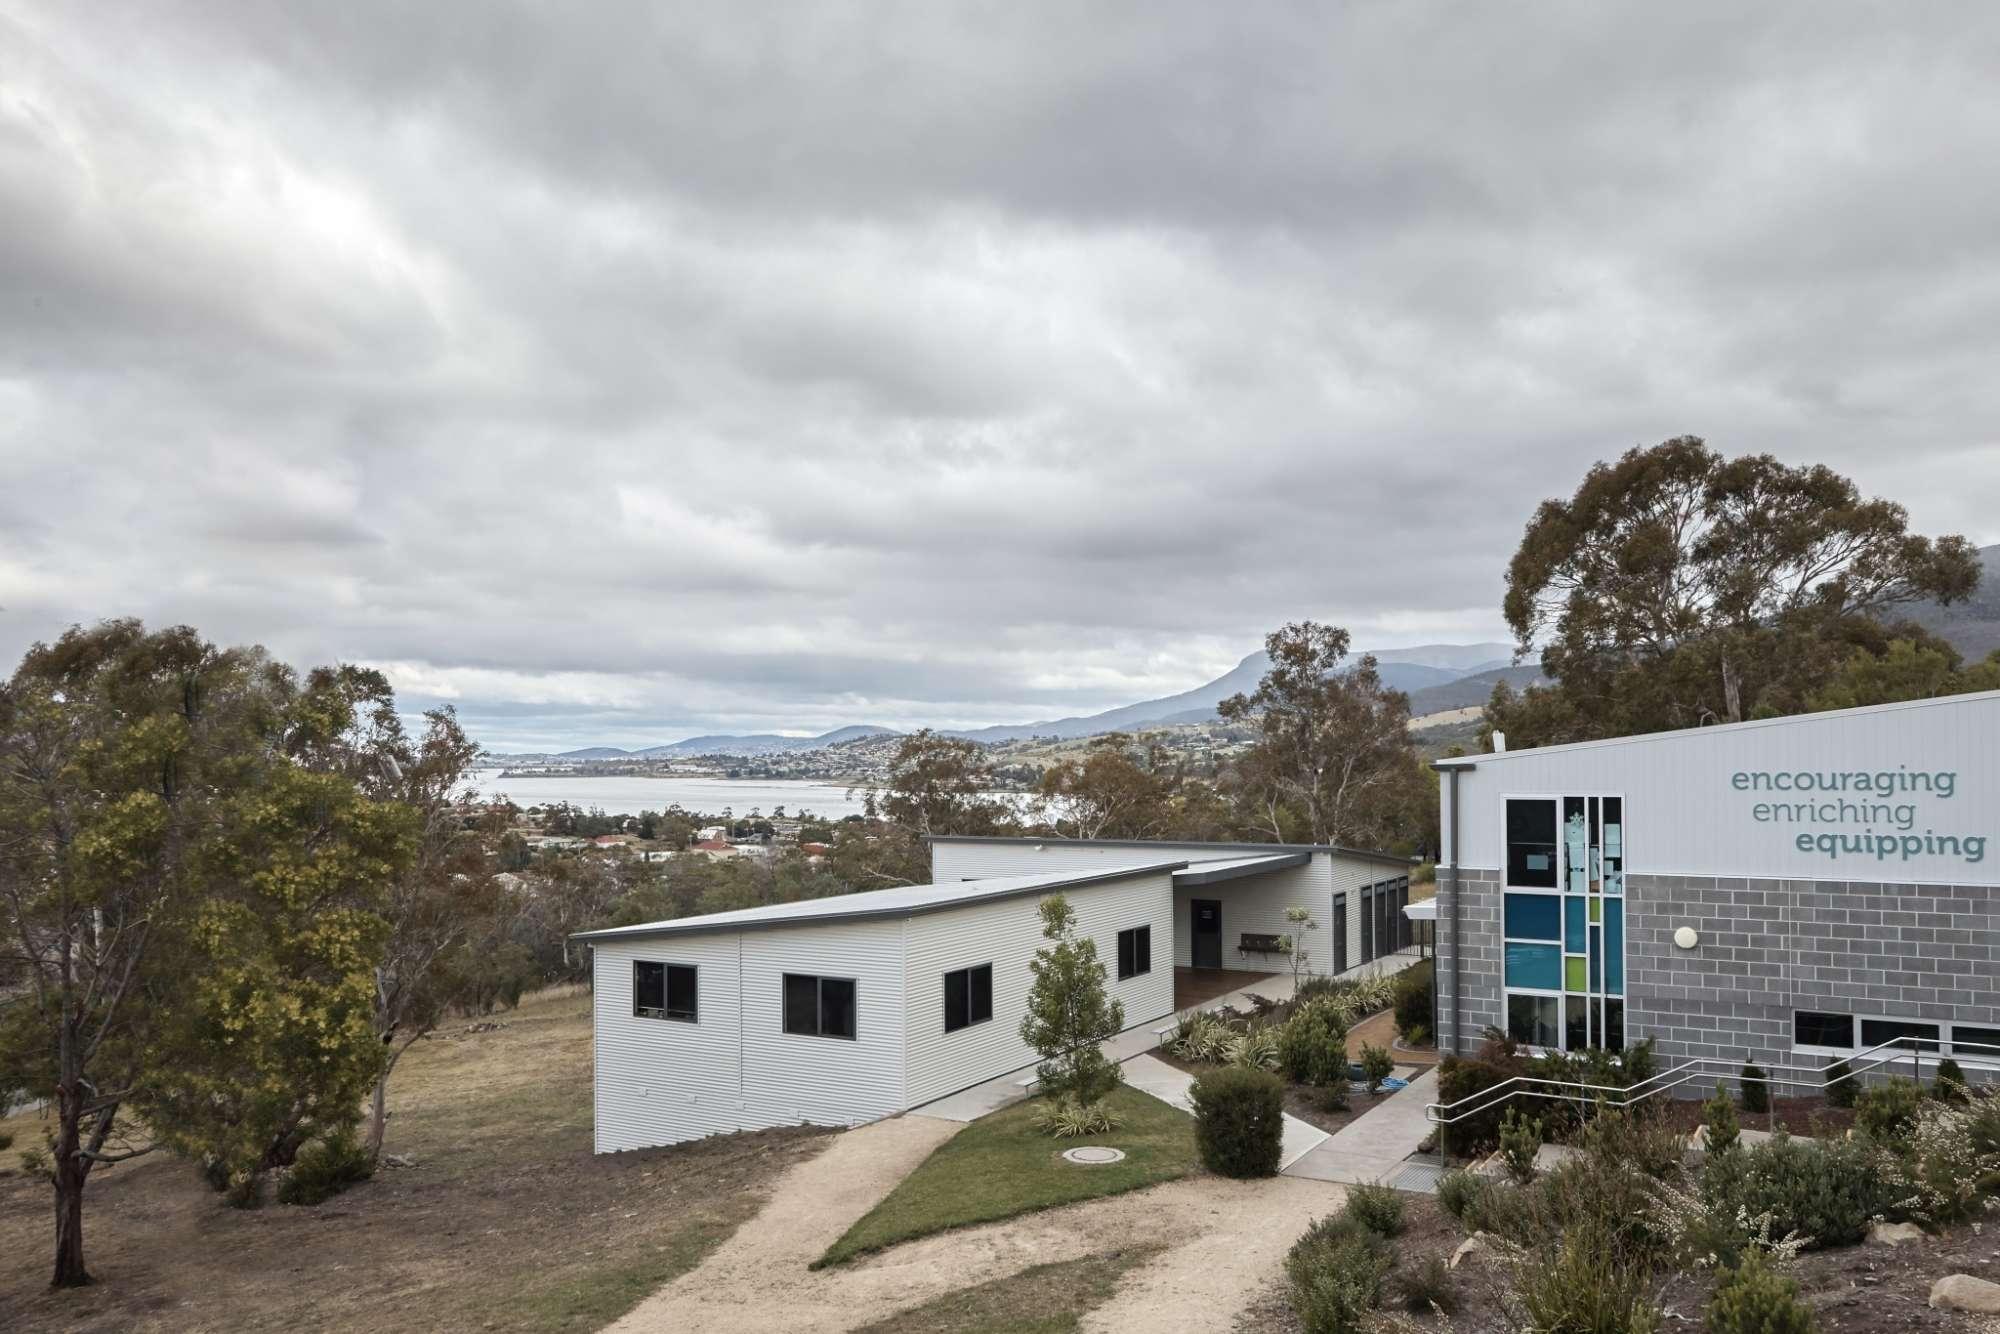 Views from modular school